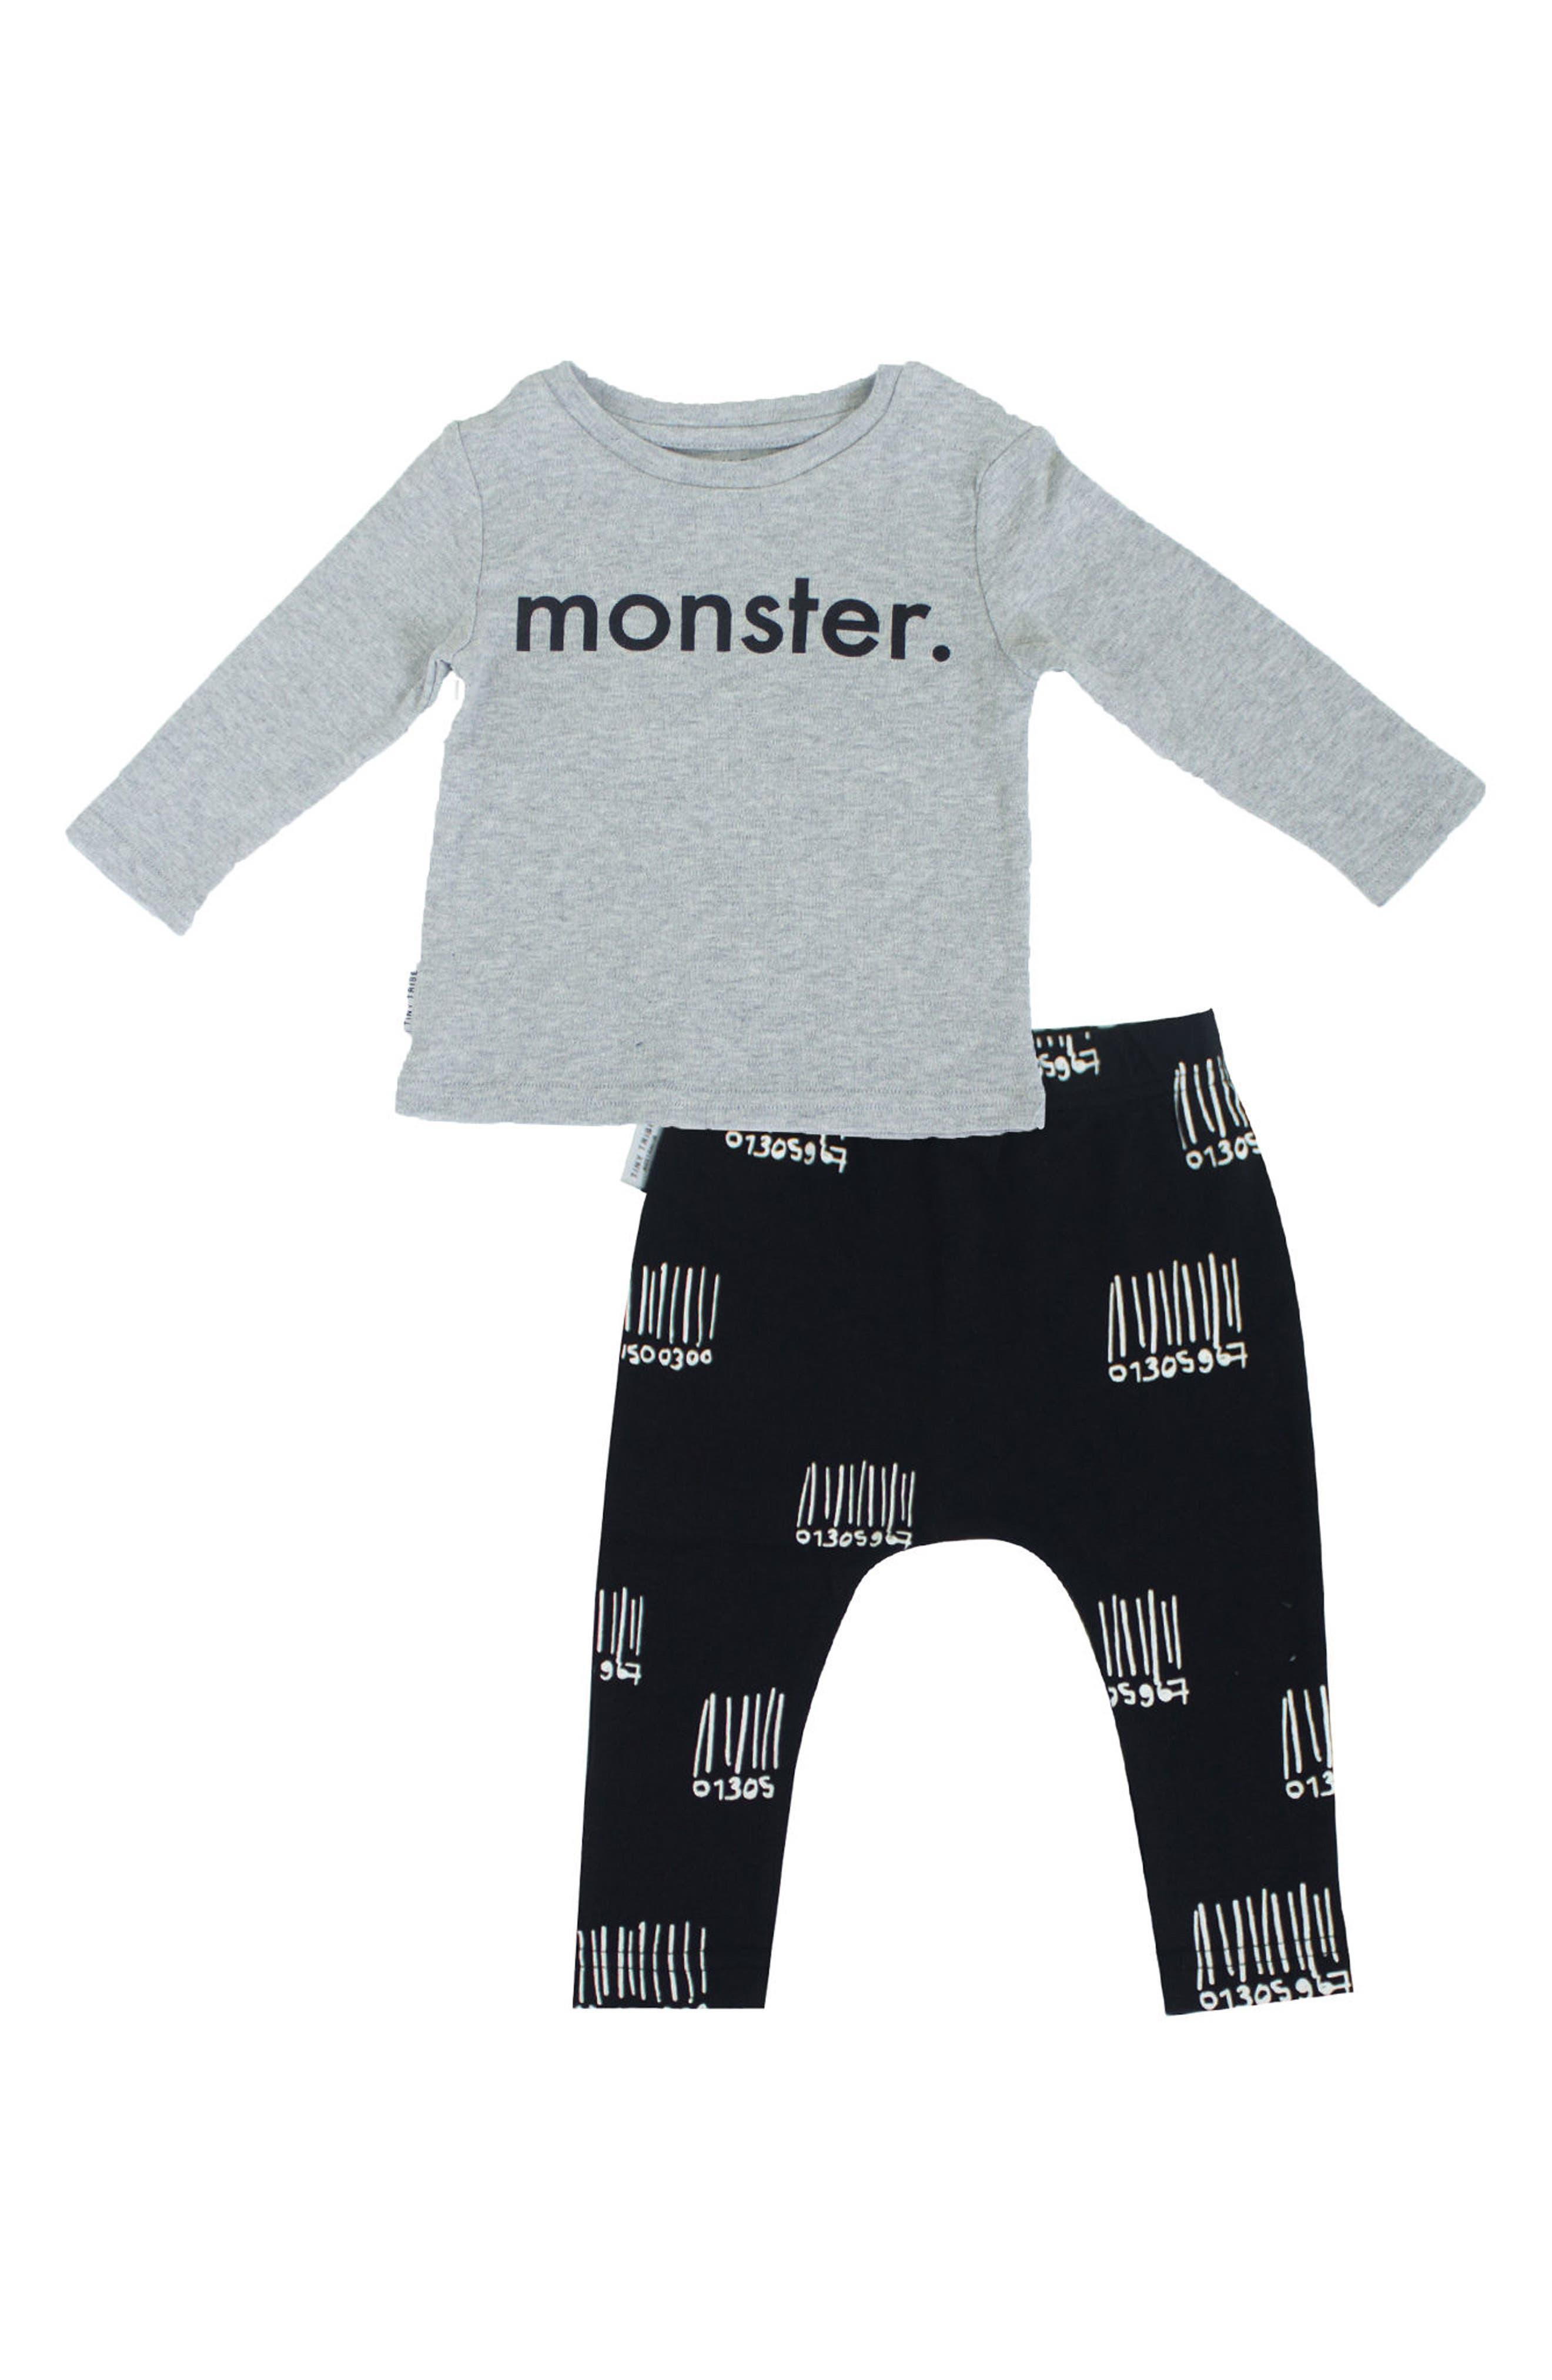 Monster T-Shirt & Leggings Set,                         Main,                         color, Grey/ Black